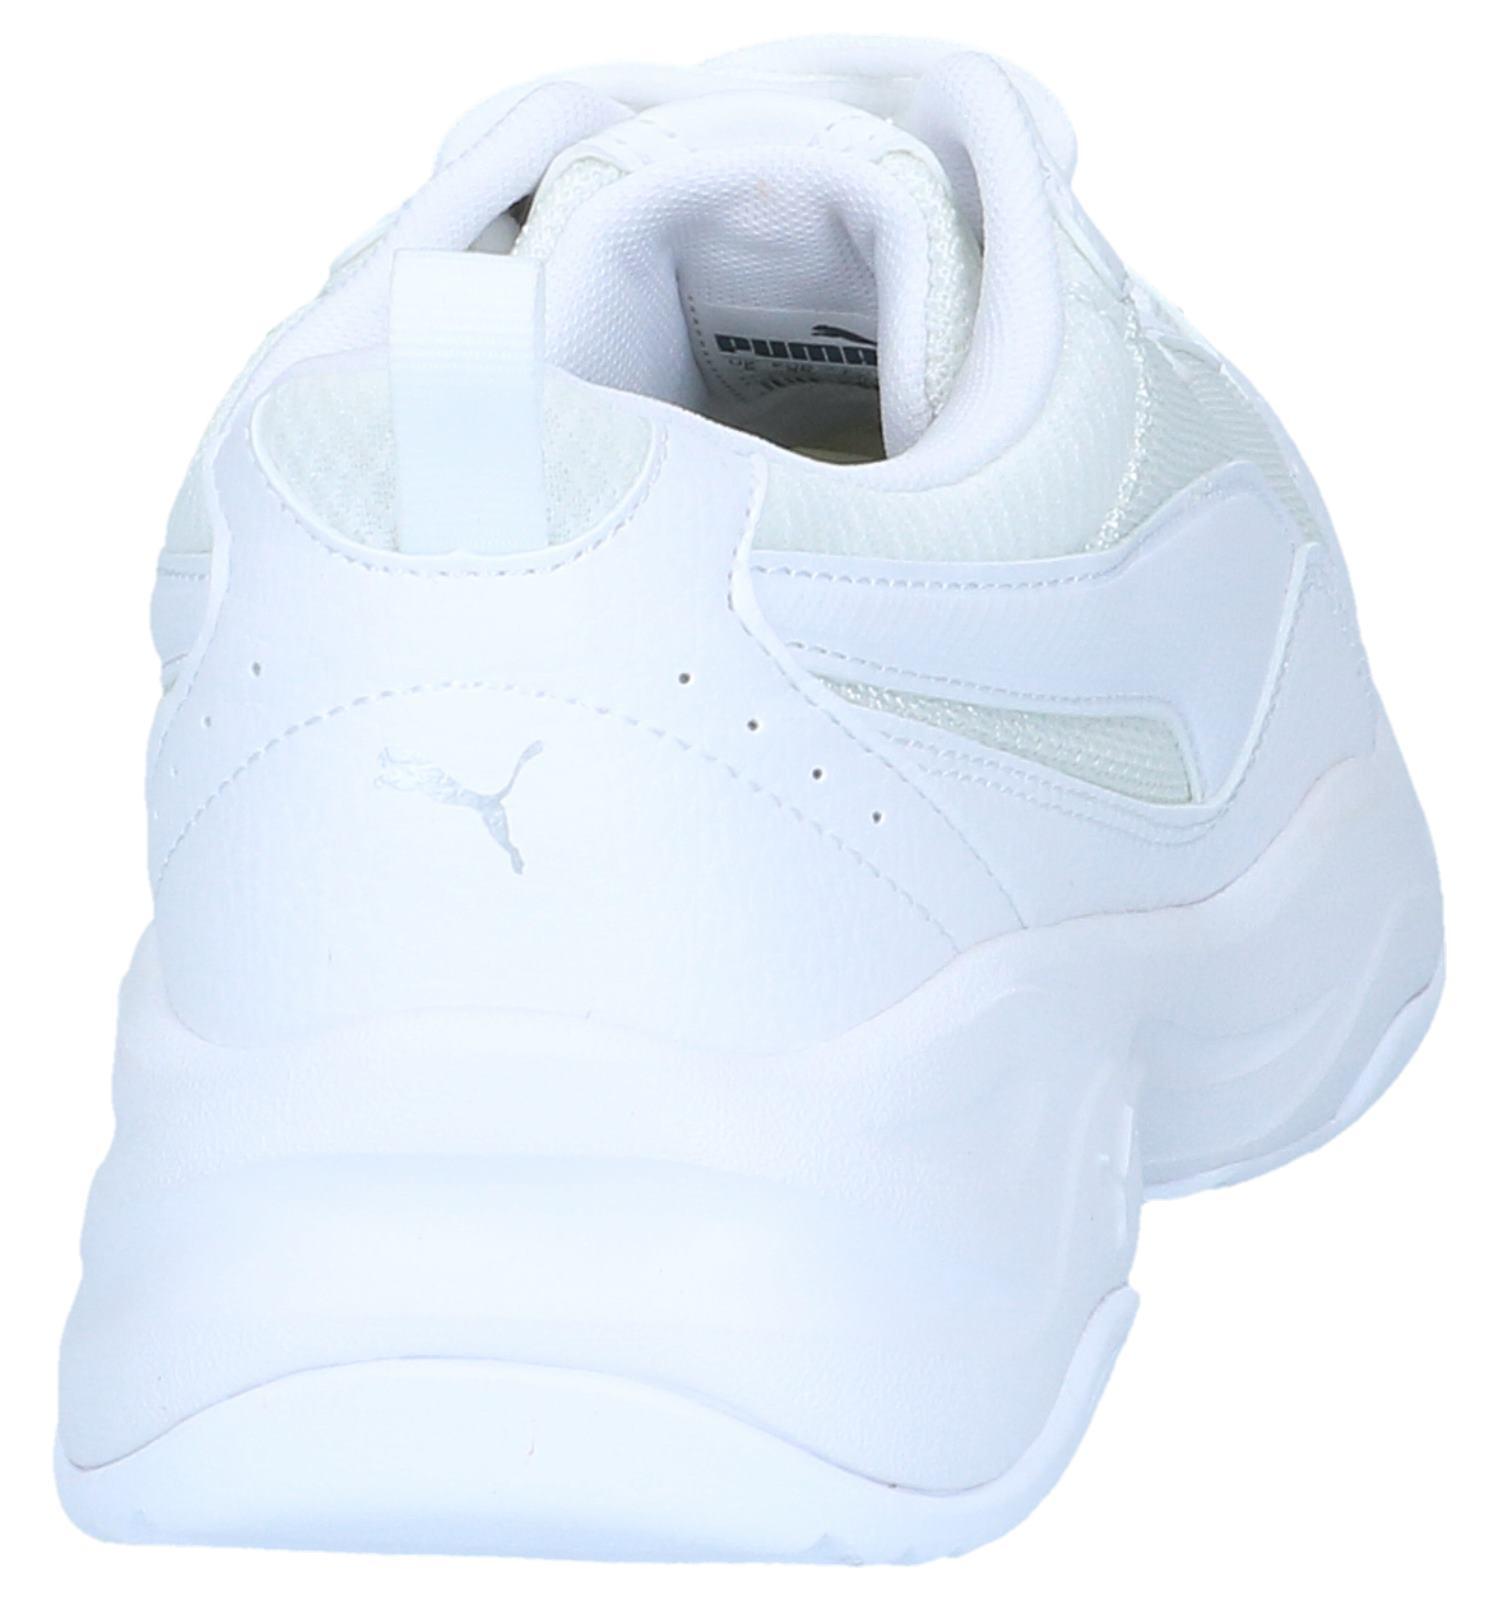 Puma Sneakers Witte Witte Sneakers Witte Cilia Sneakers Witte Sneakers Puma Cilia Cilia Puma QrEdCxWBeo